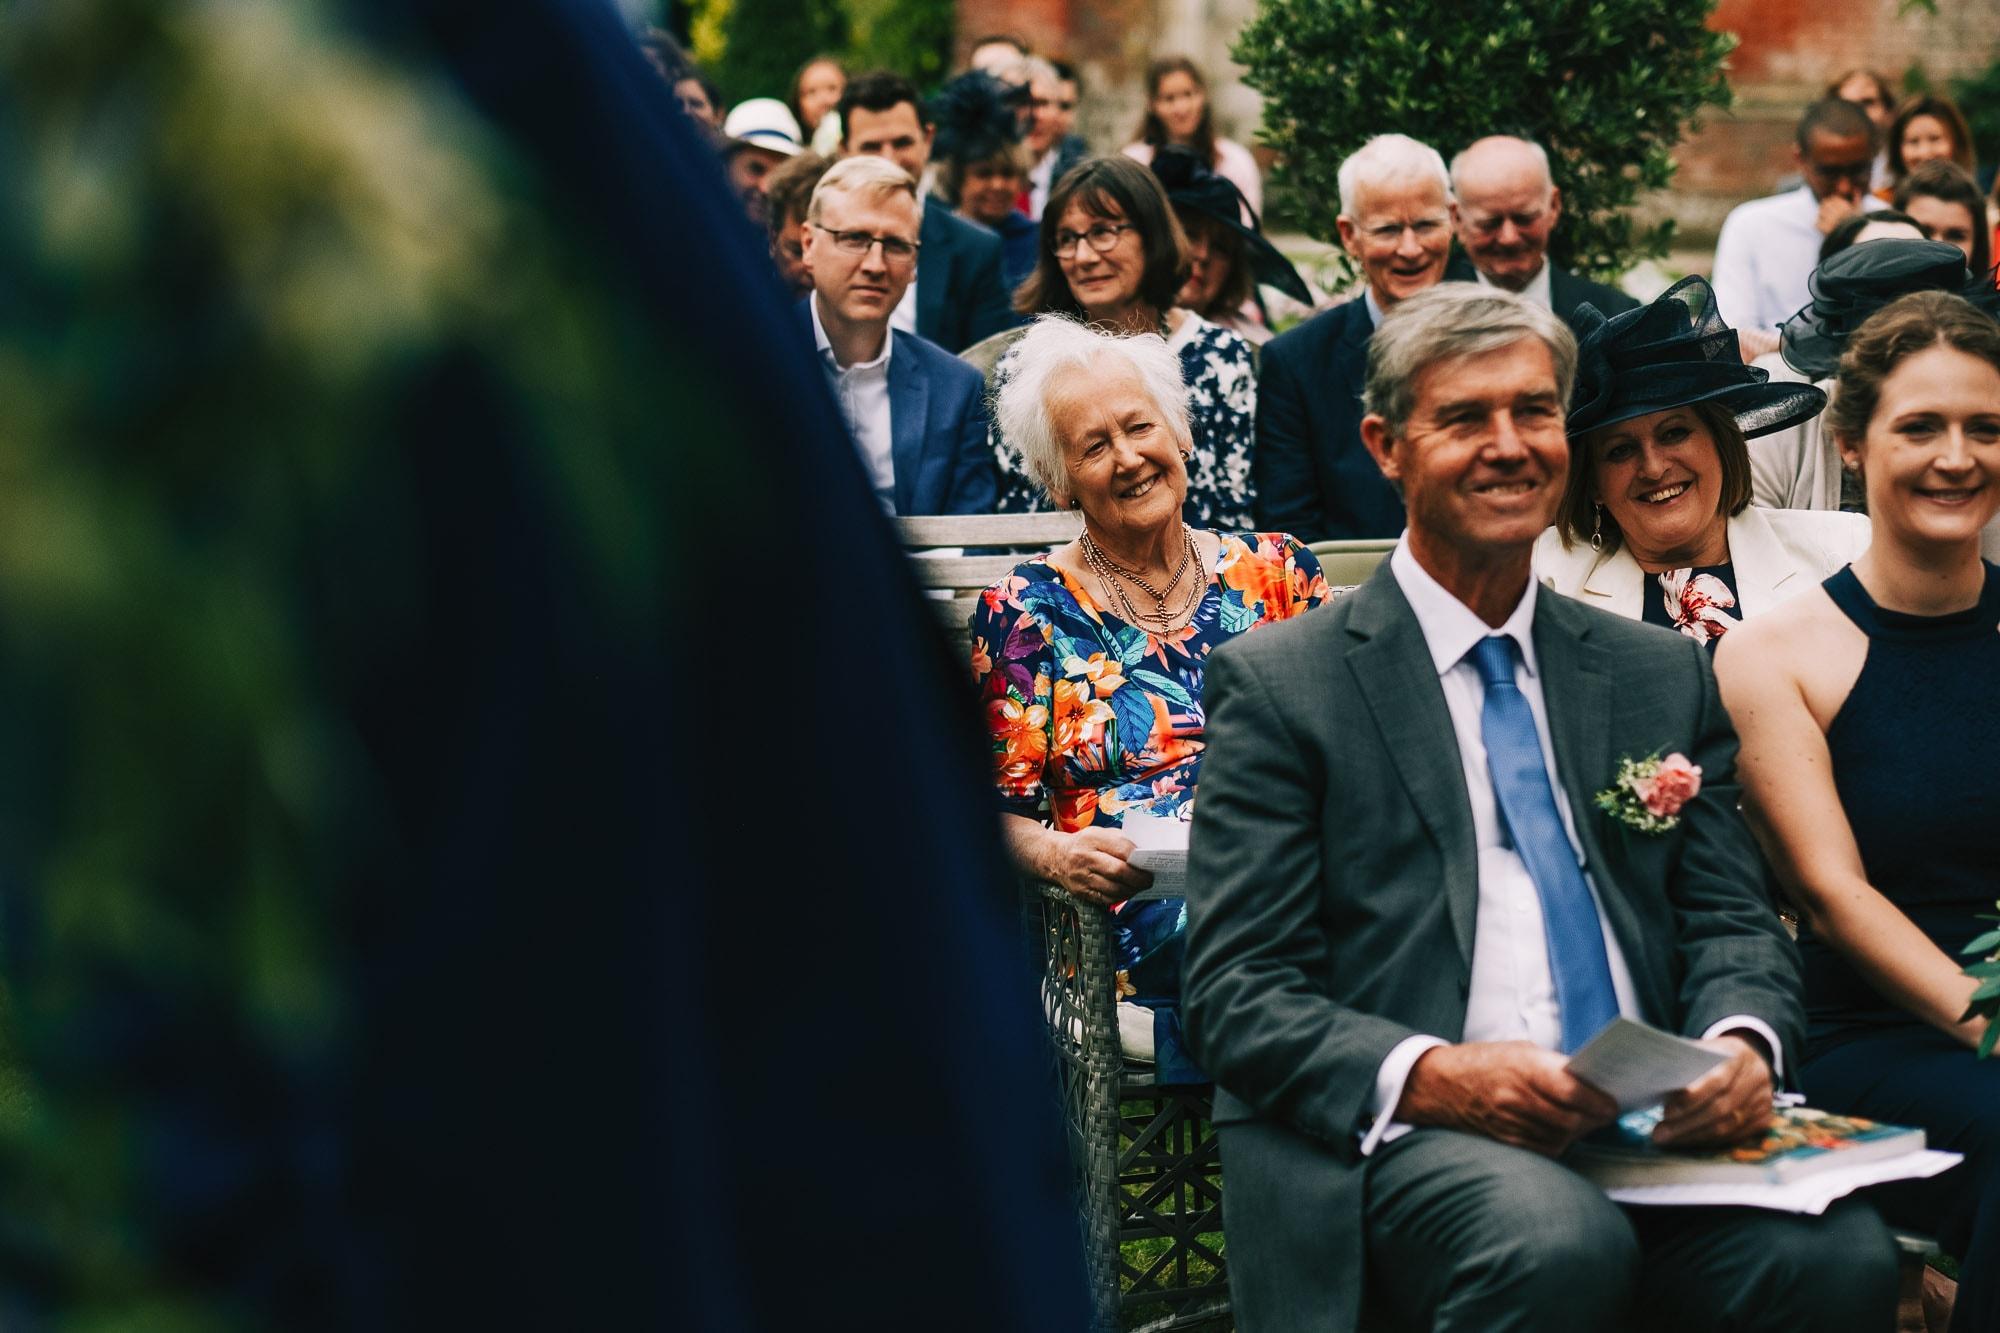 Canterbury Wedding Photographer - Cheeky flower girl